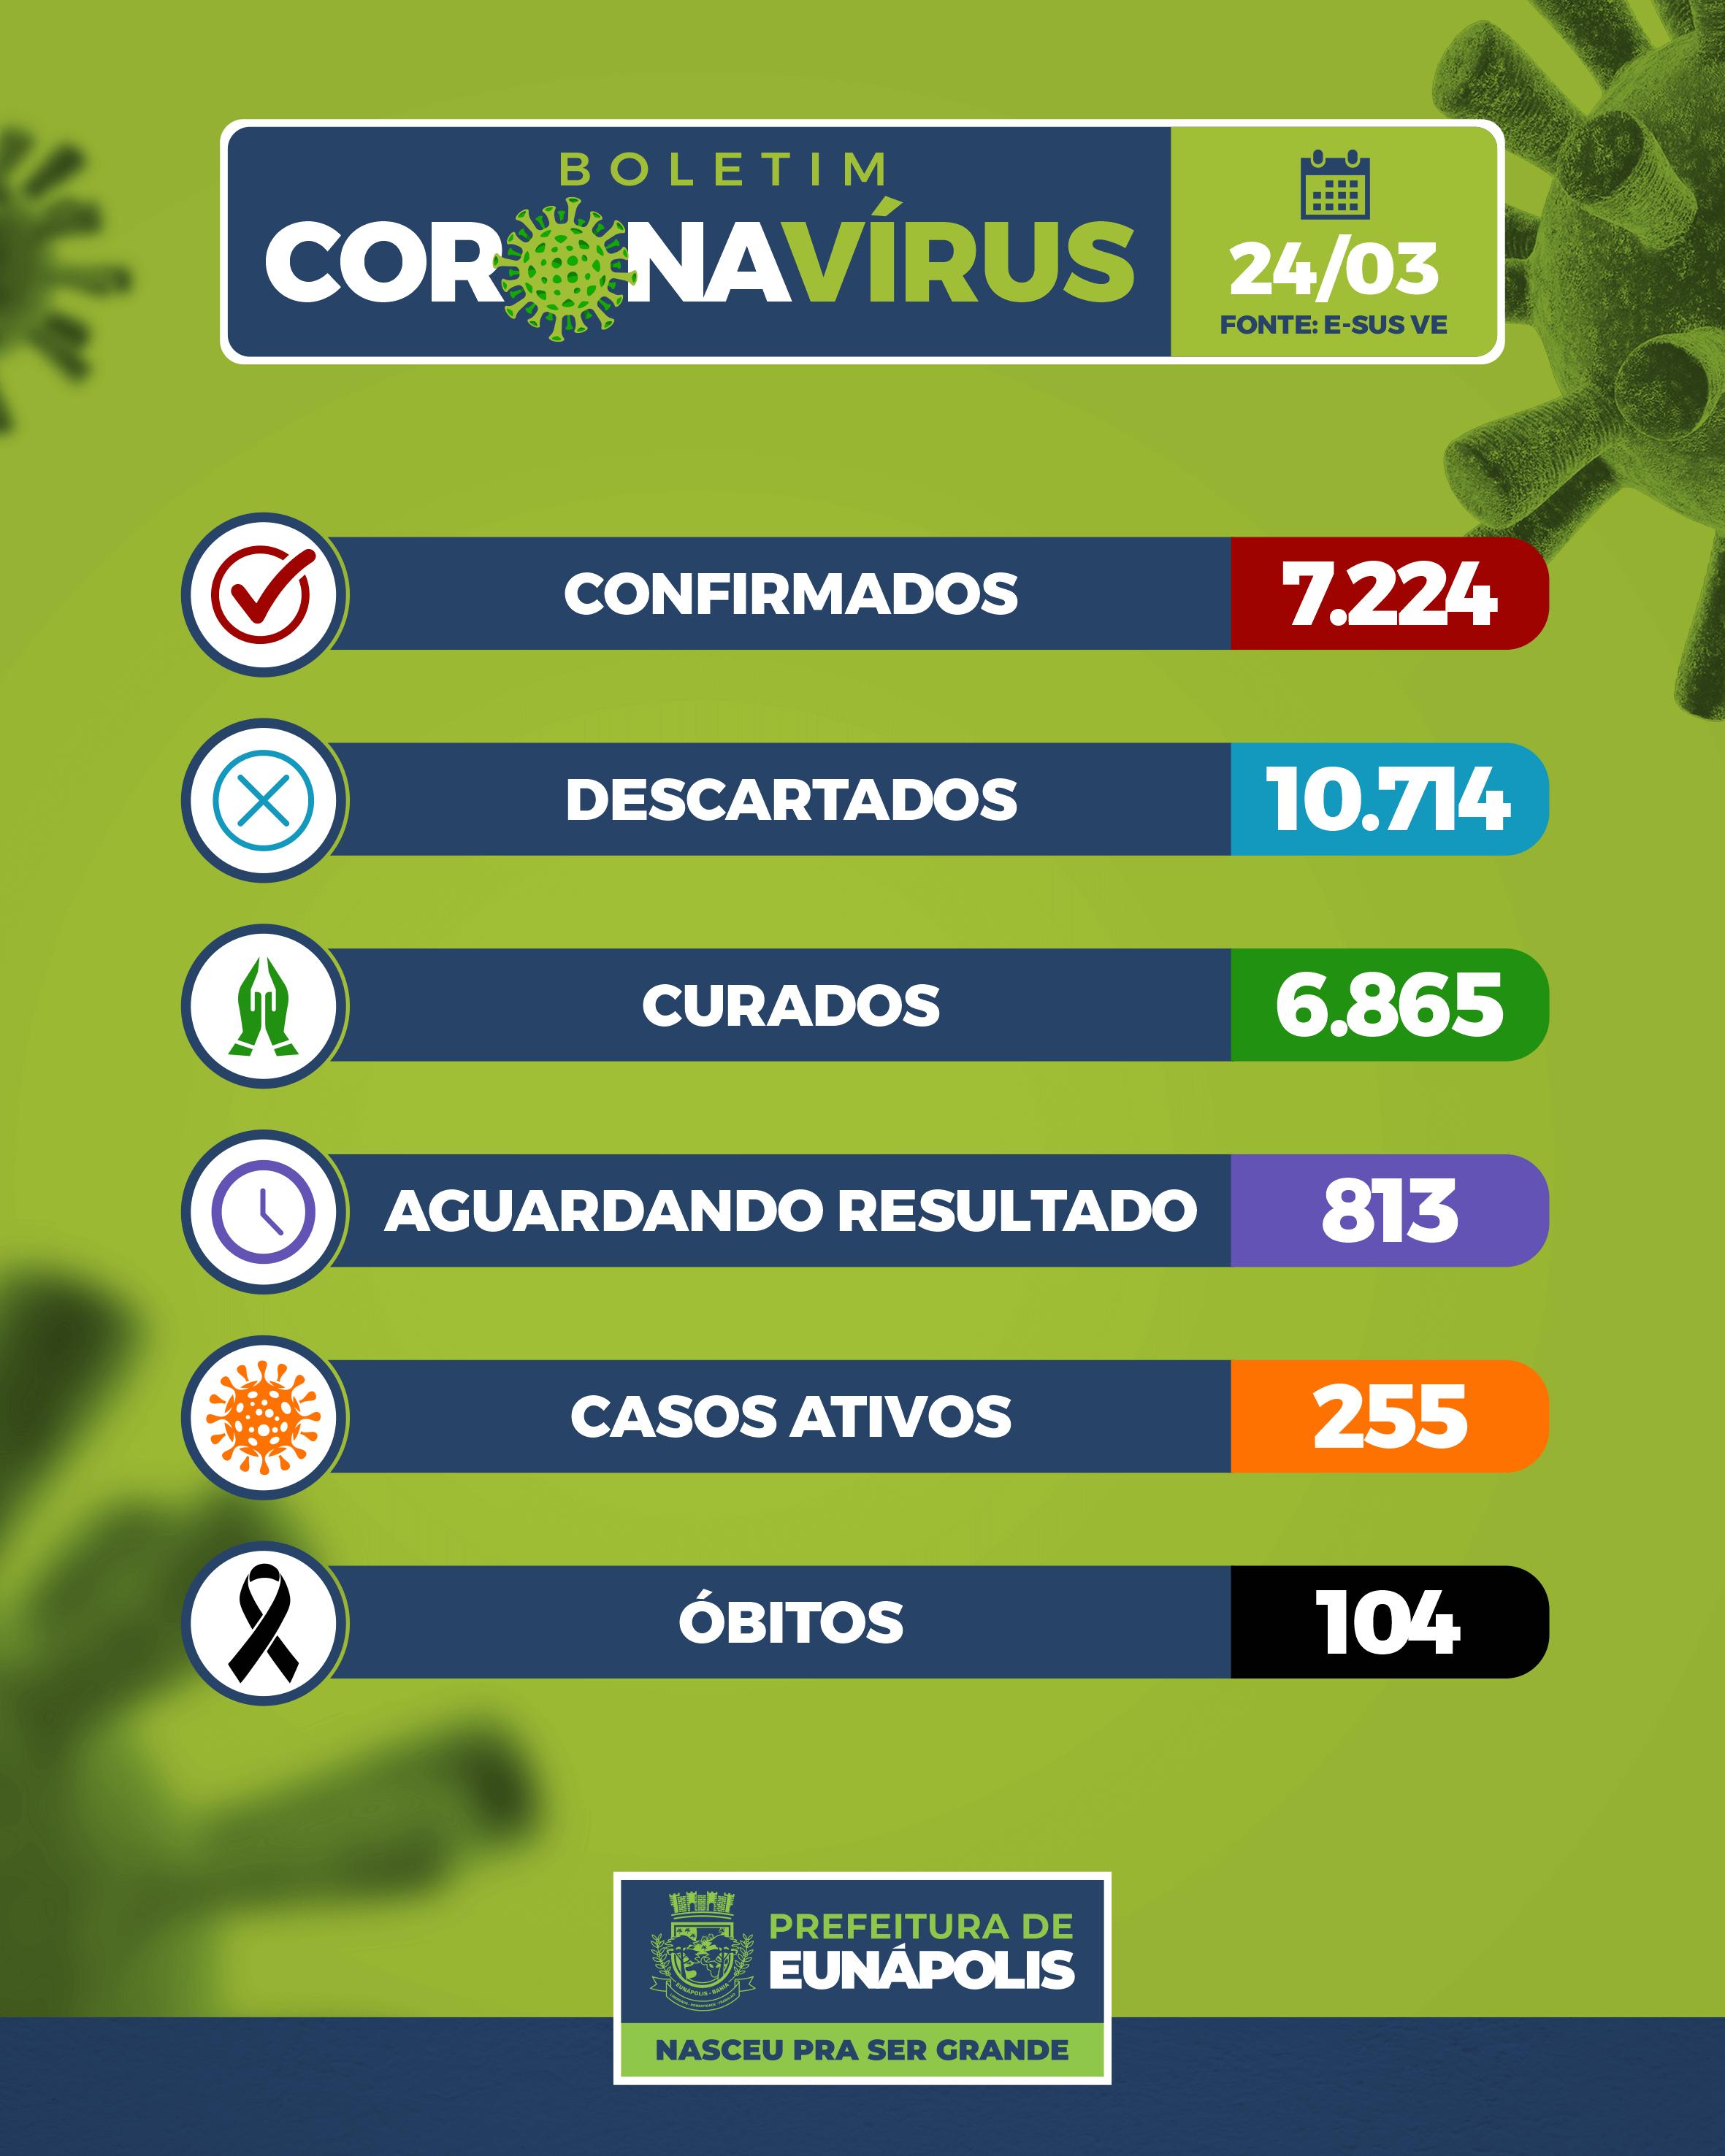 Boletim Epidemiológico Coronavírus do Município de Eunápolis para a data de hoje, 24/03/2021. 18